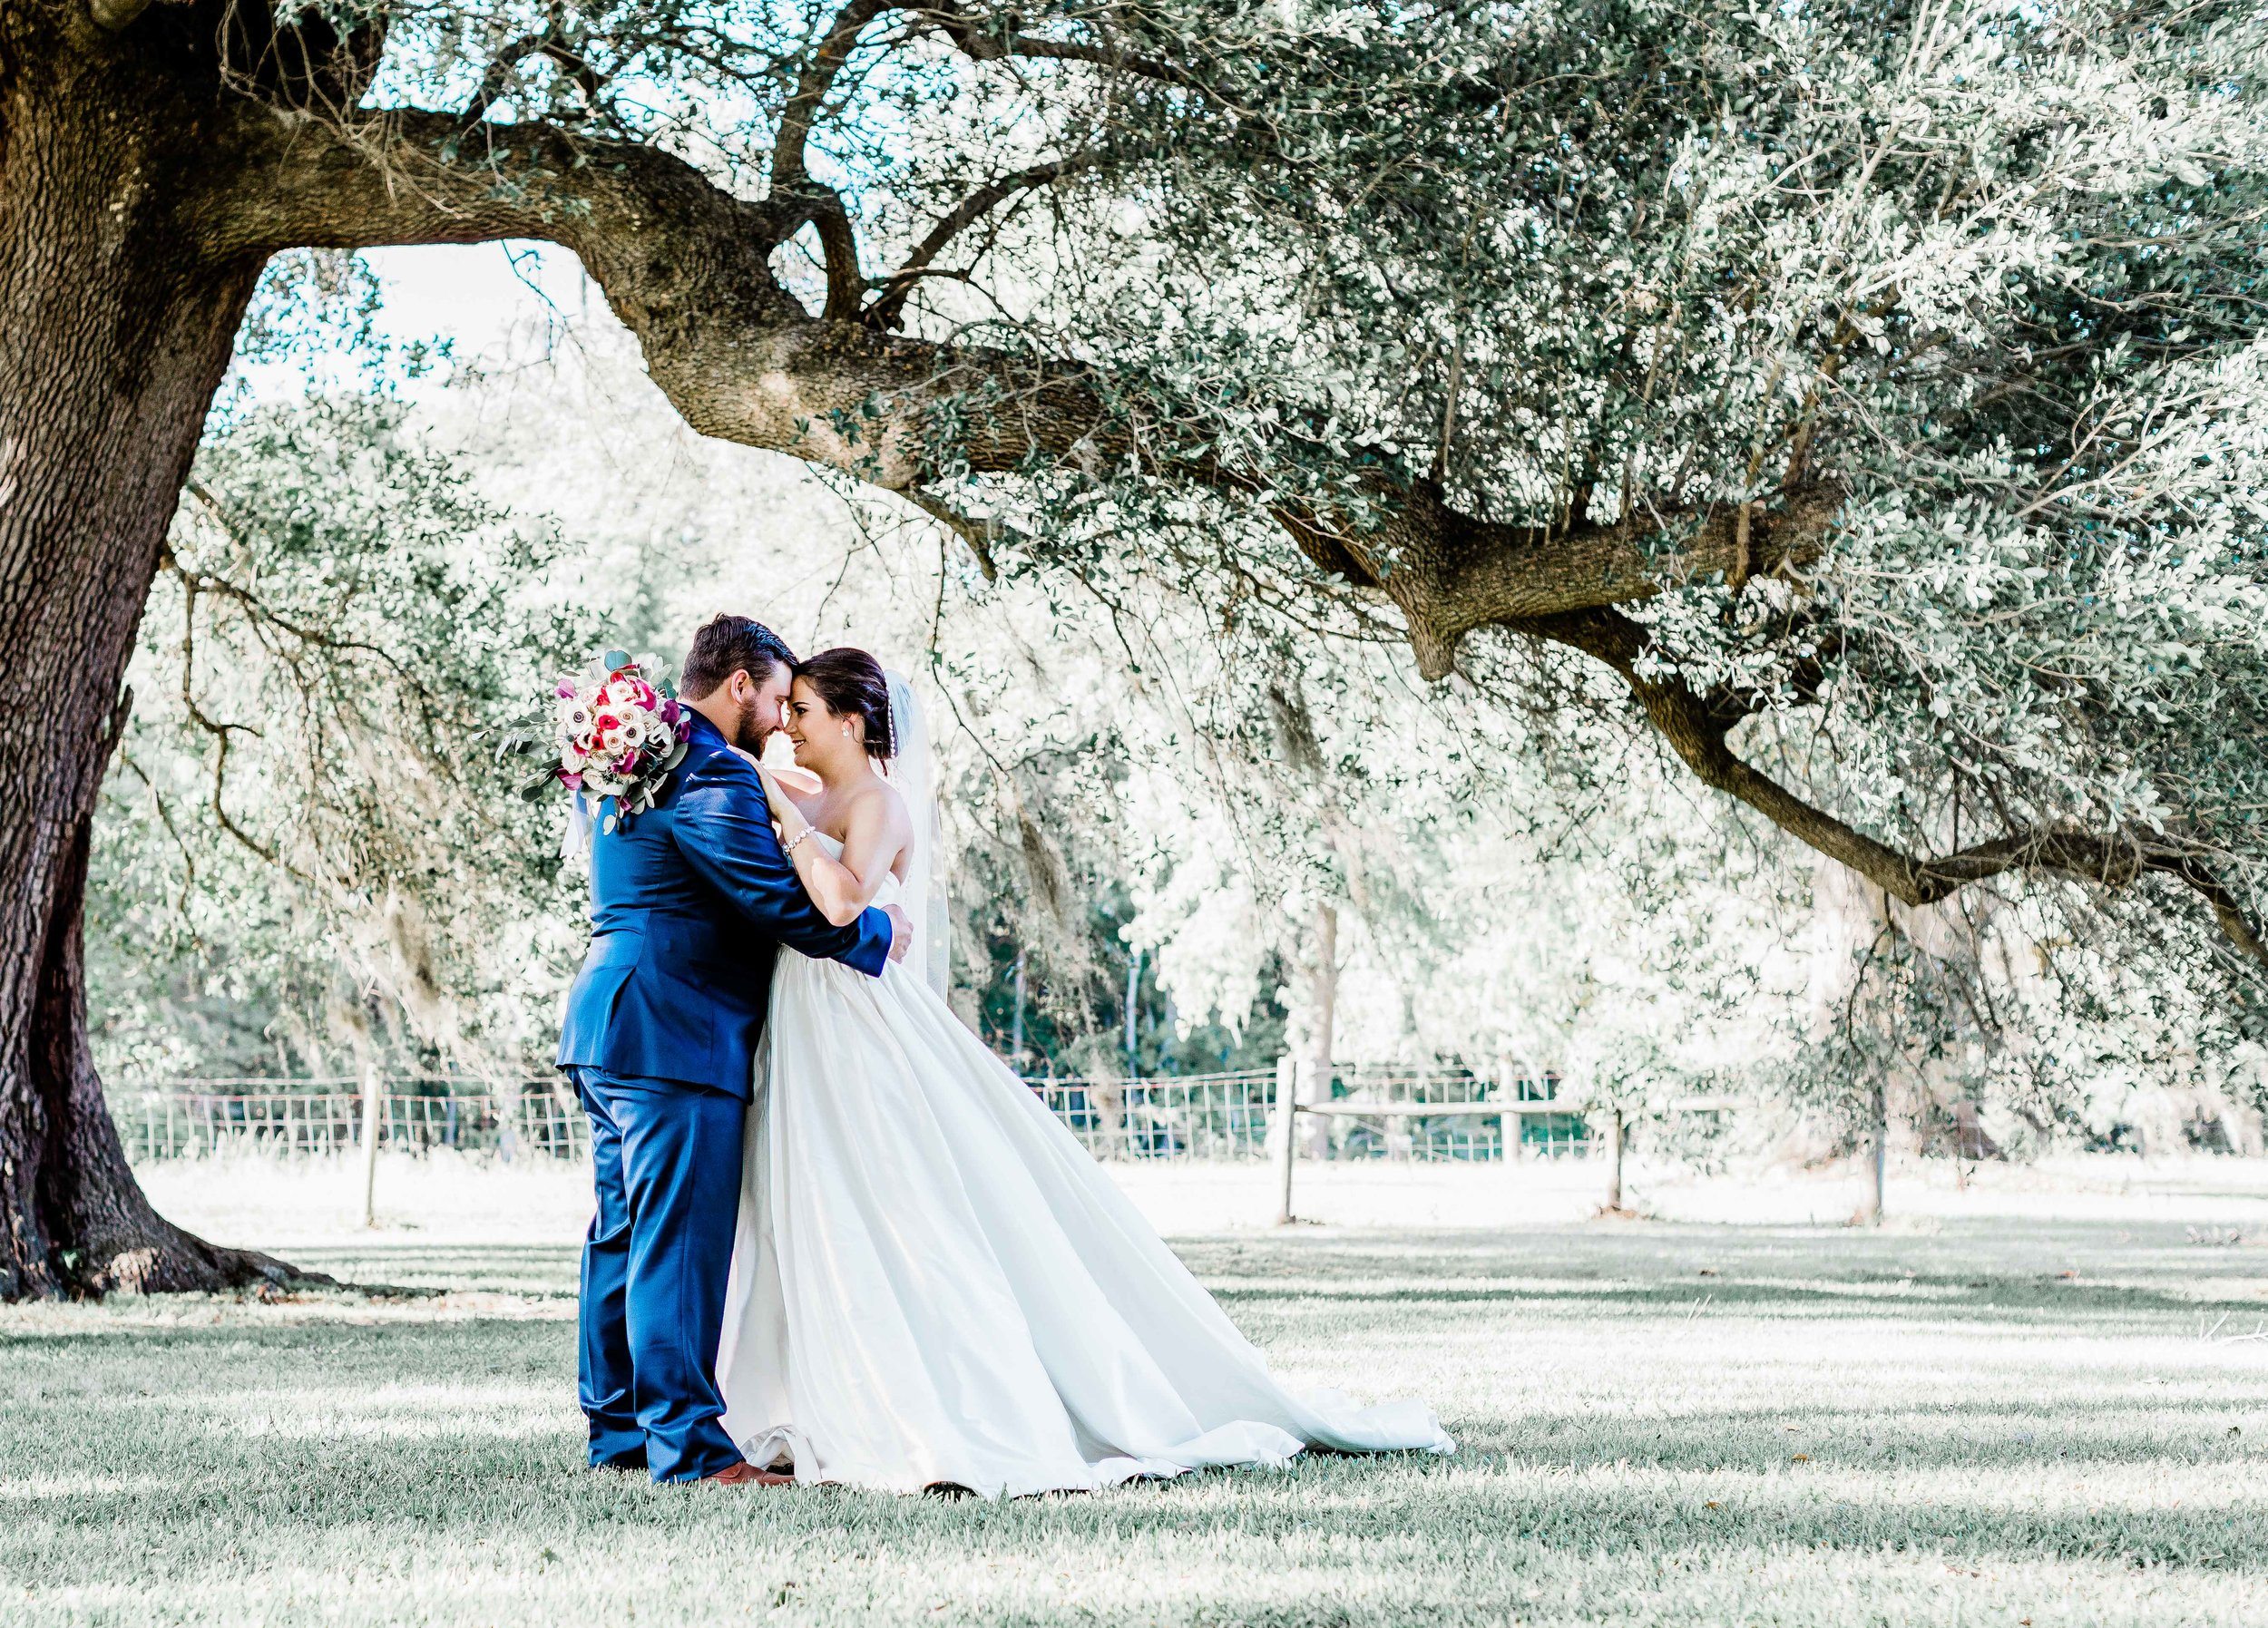 20190427-Southern Lens Photography- Savannah Wedding Photographer-Screven and Caroline-201974.jpg